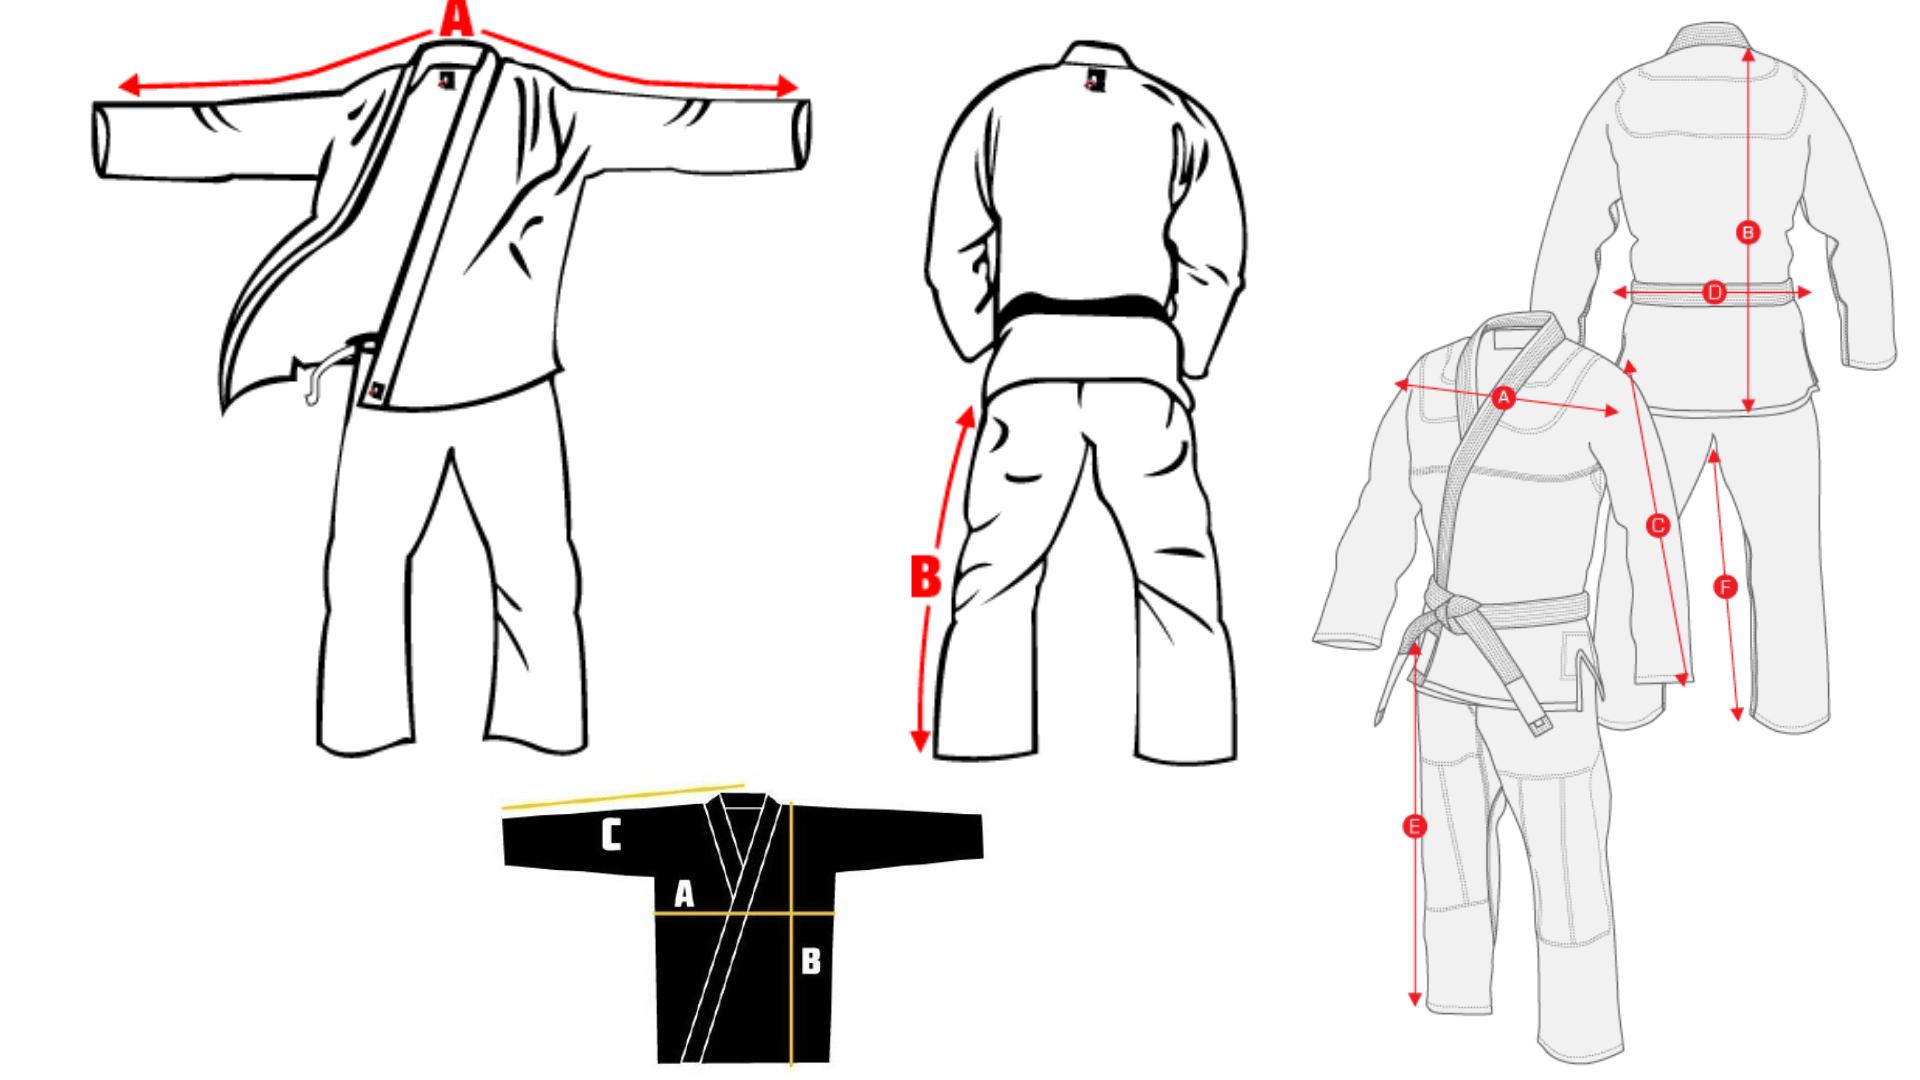 Jiu Jitsu Gi Sizes - Variations in Measurement Approaches